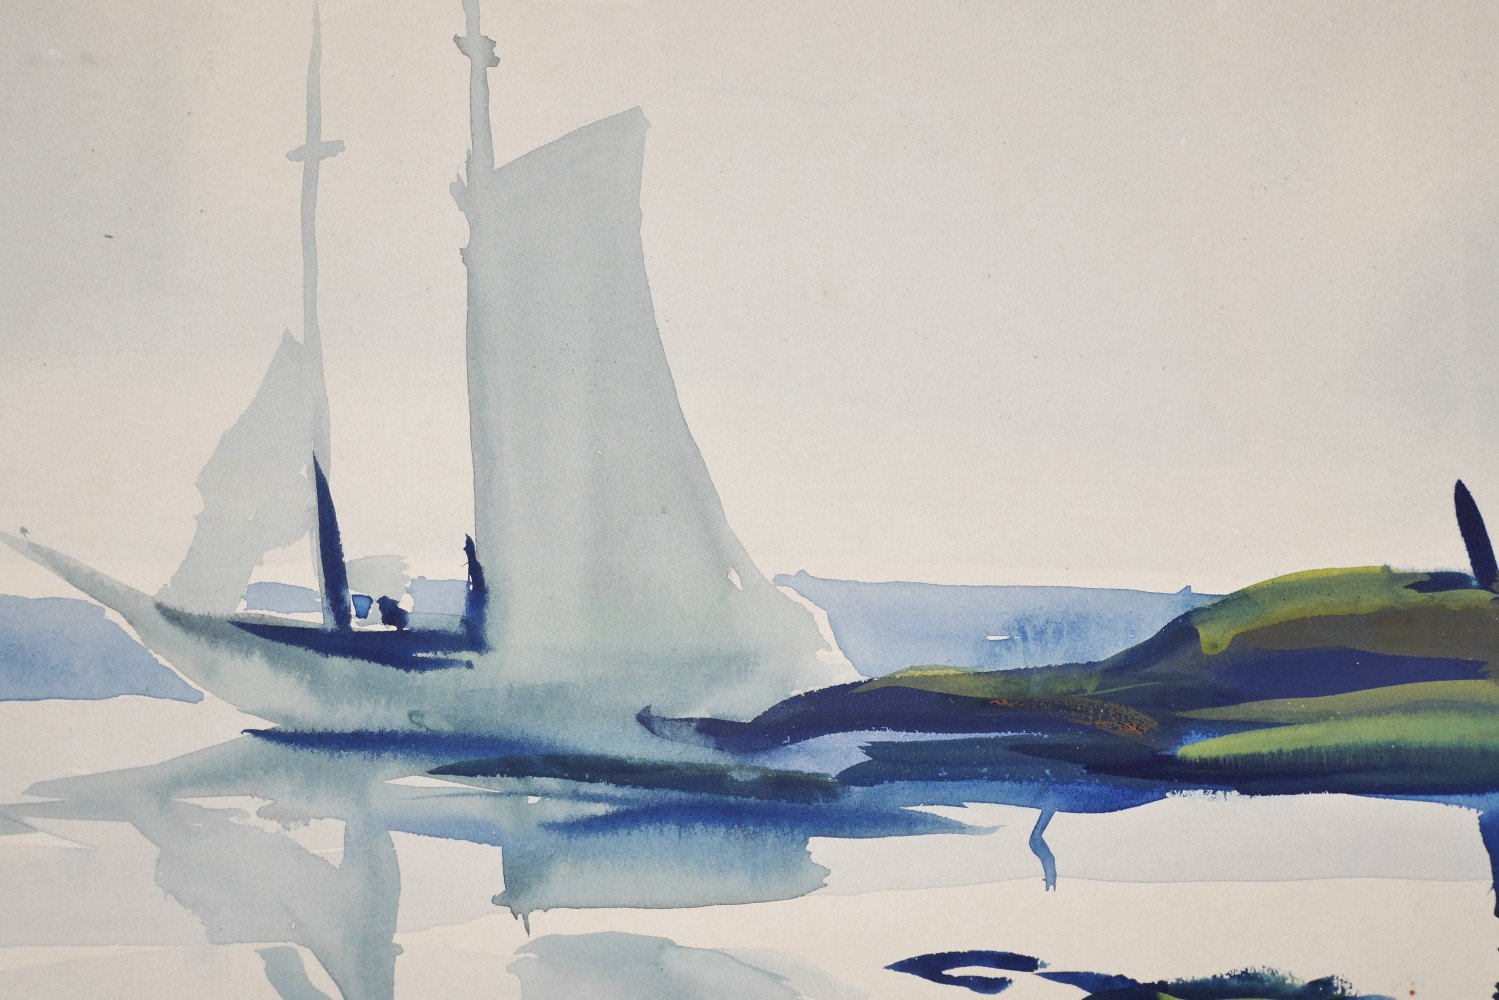 Morning by Carl Frederick Gaertner